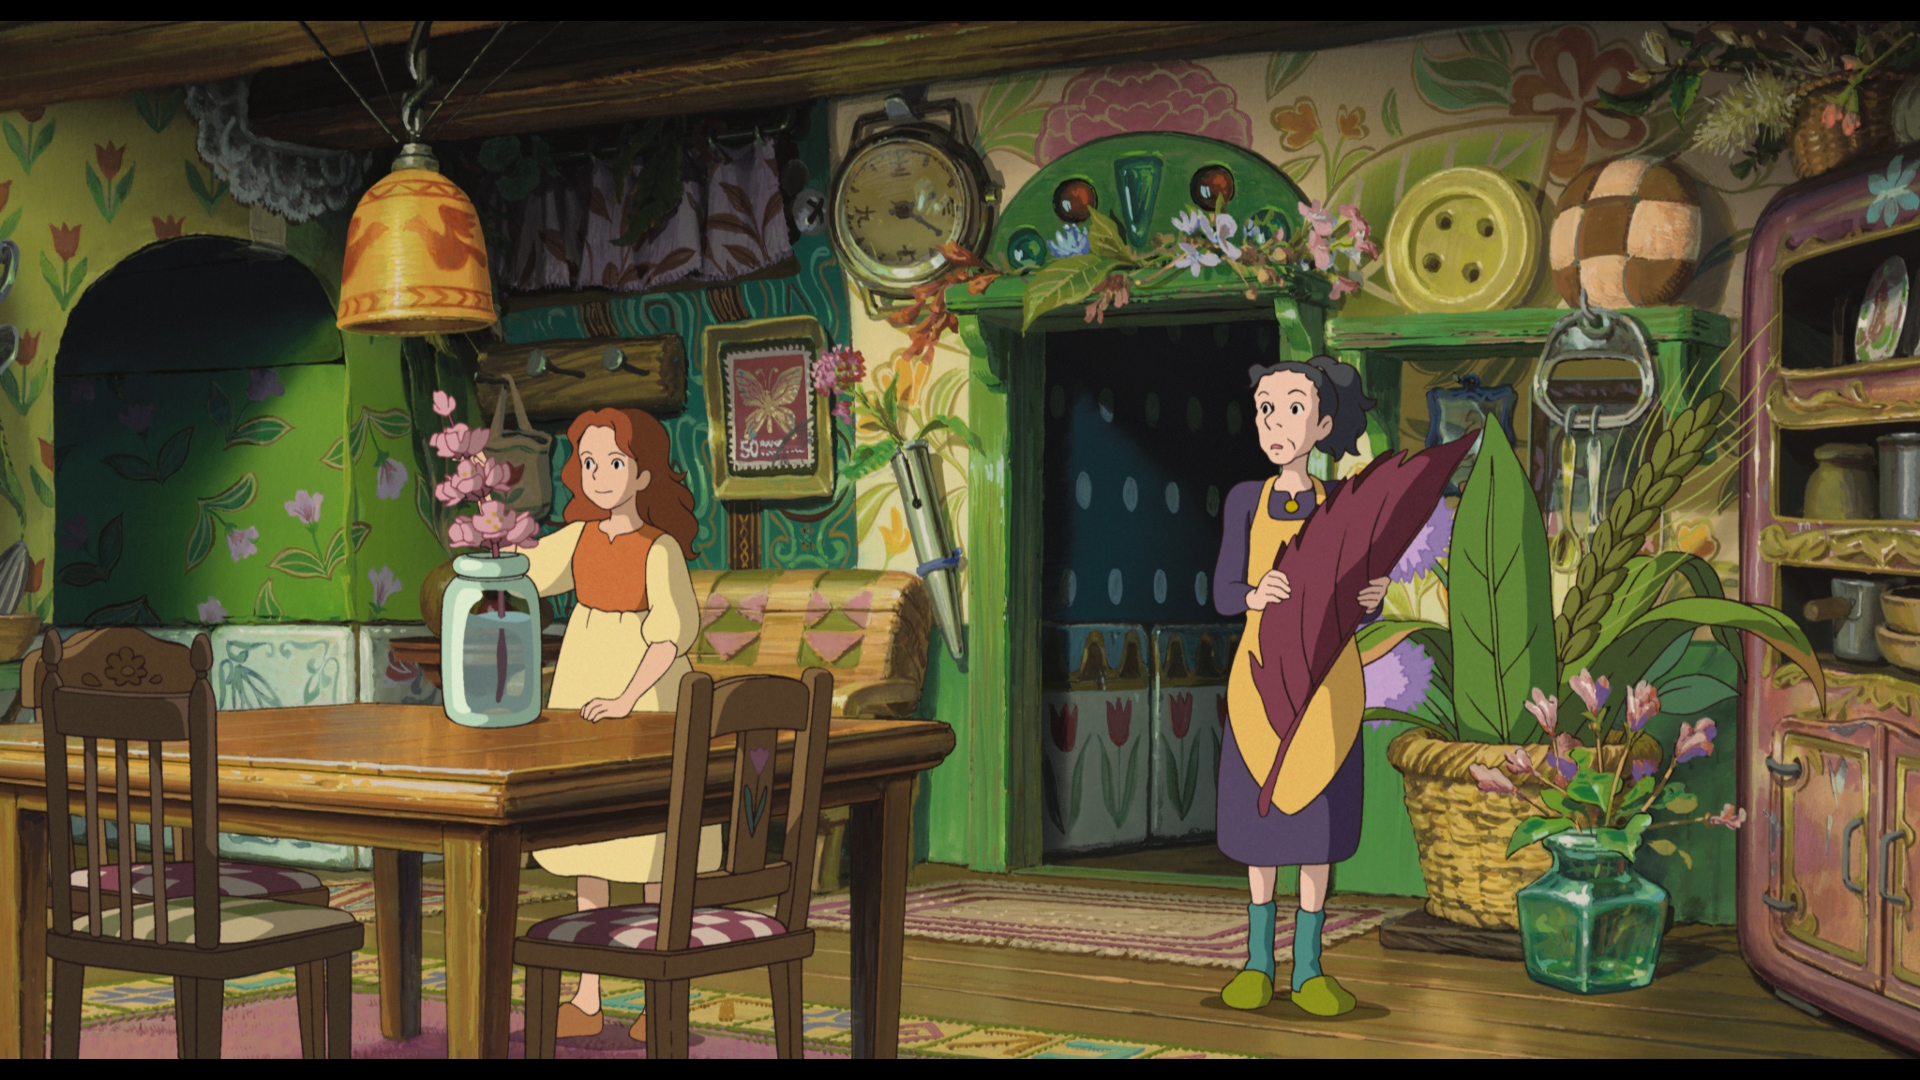 The secret world of arrietty full movie free watch now